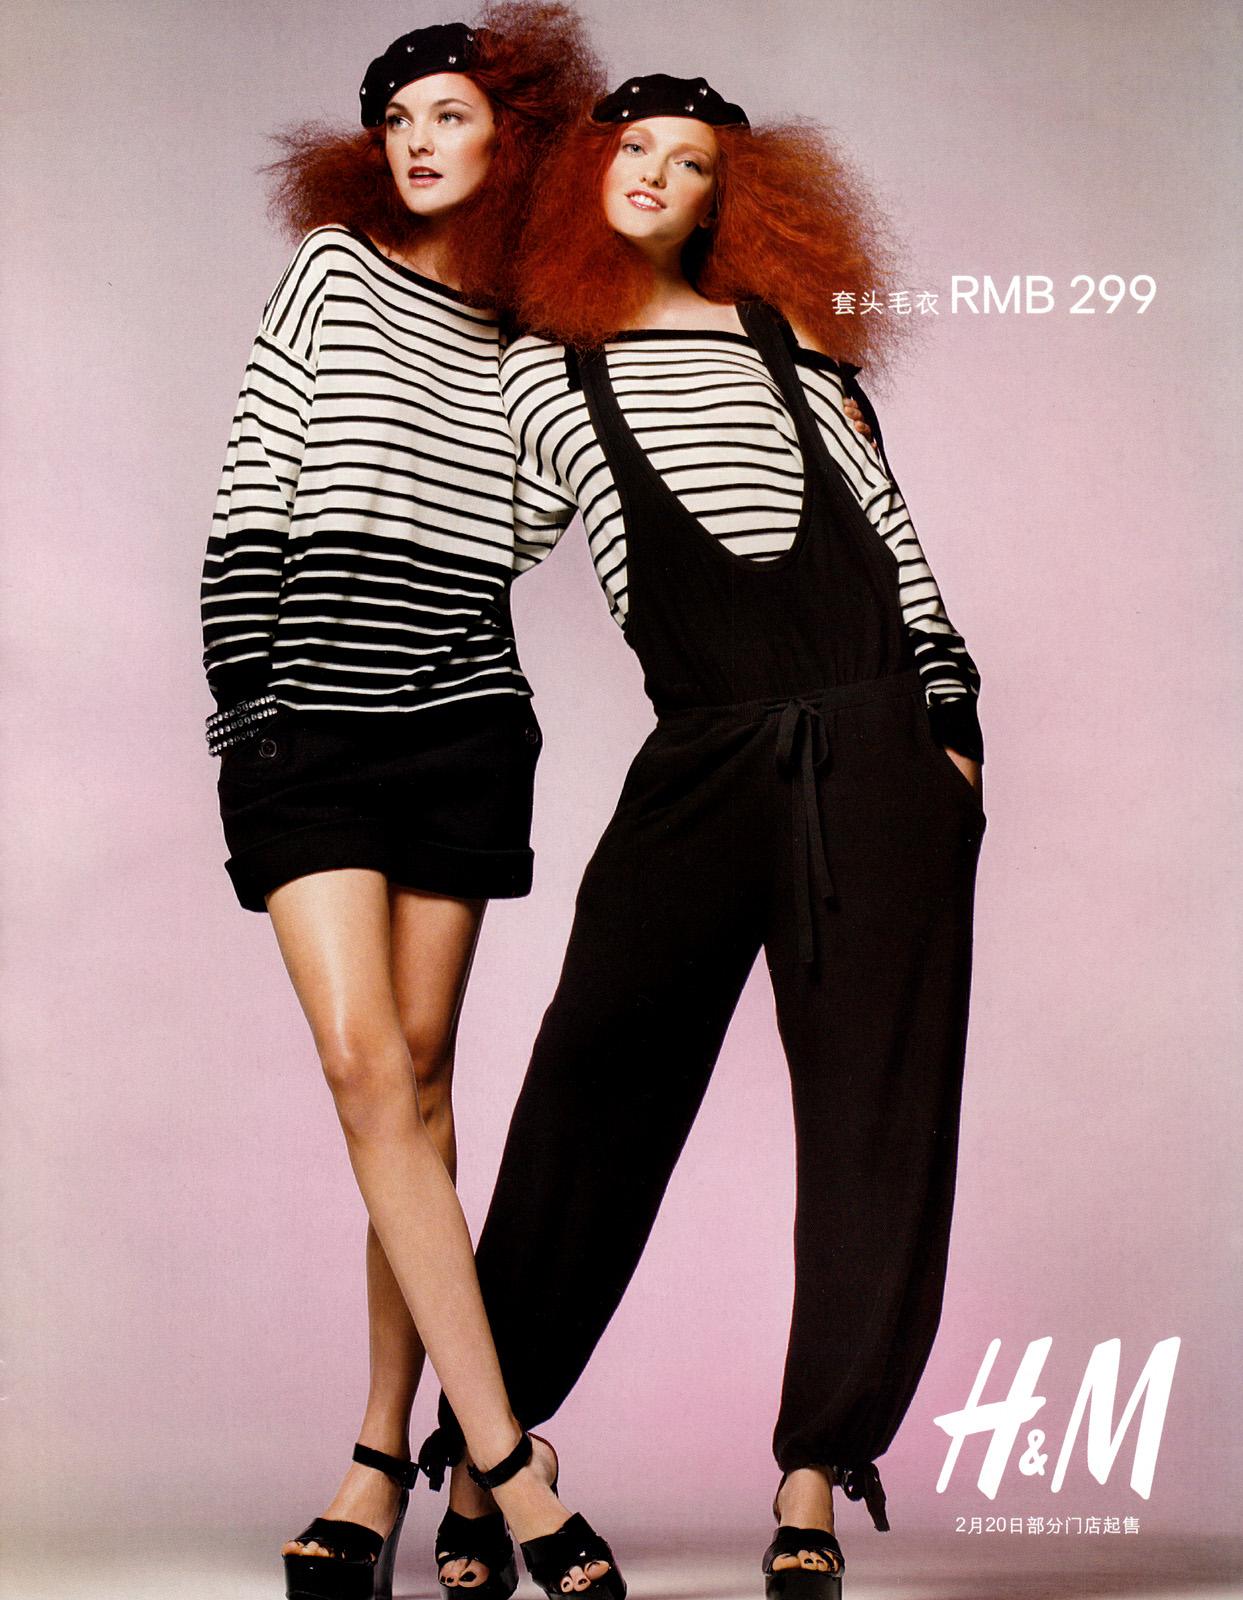 sonia rykiel pour h m spring summer 2010 ad campaign. Black Bedroom Furniture Sets. Home Design Ideas